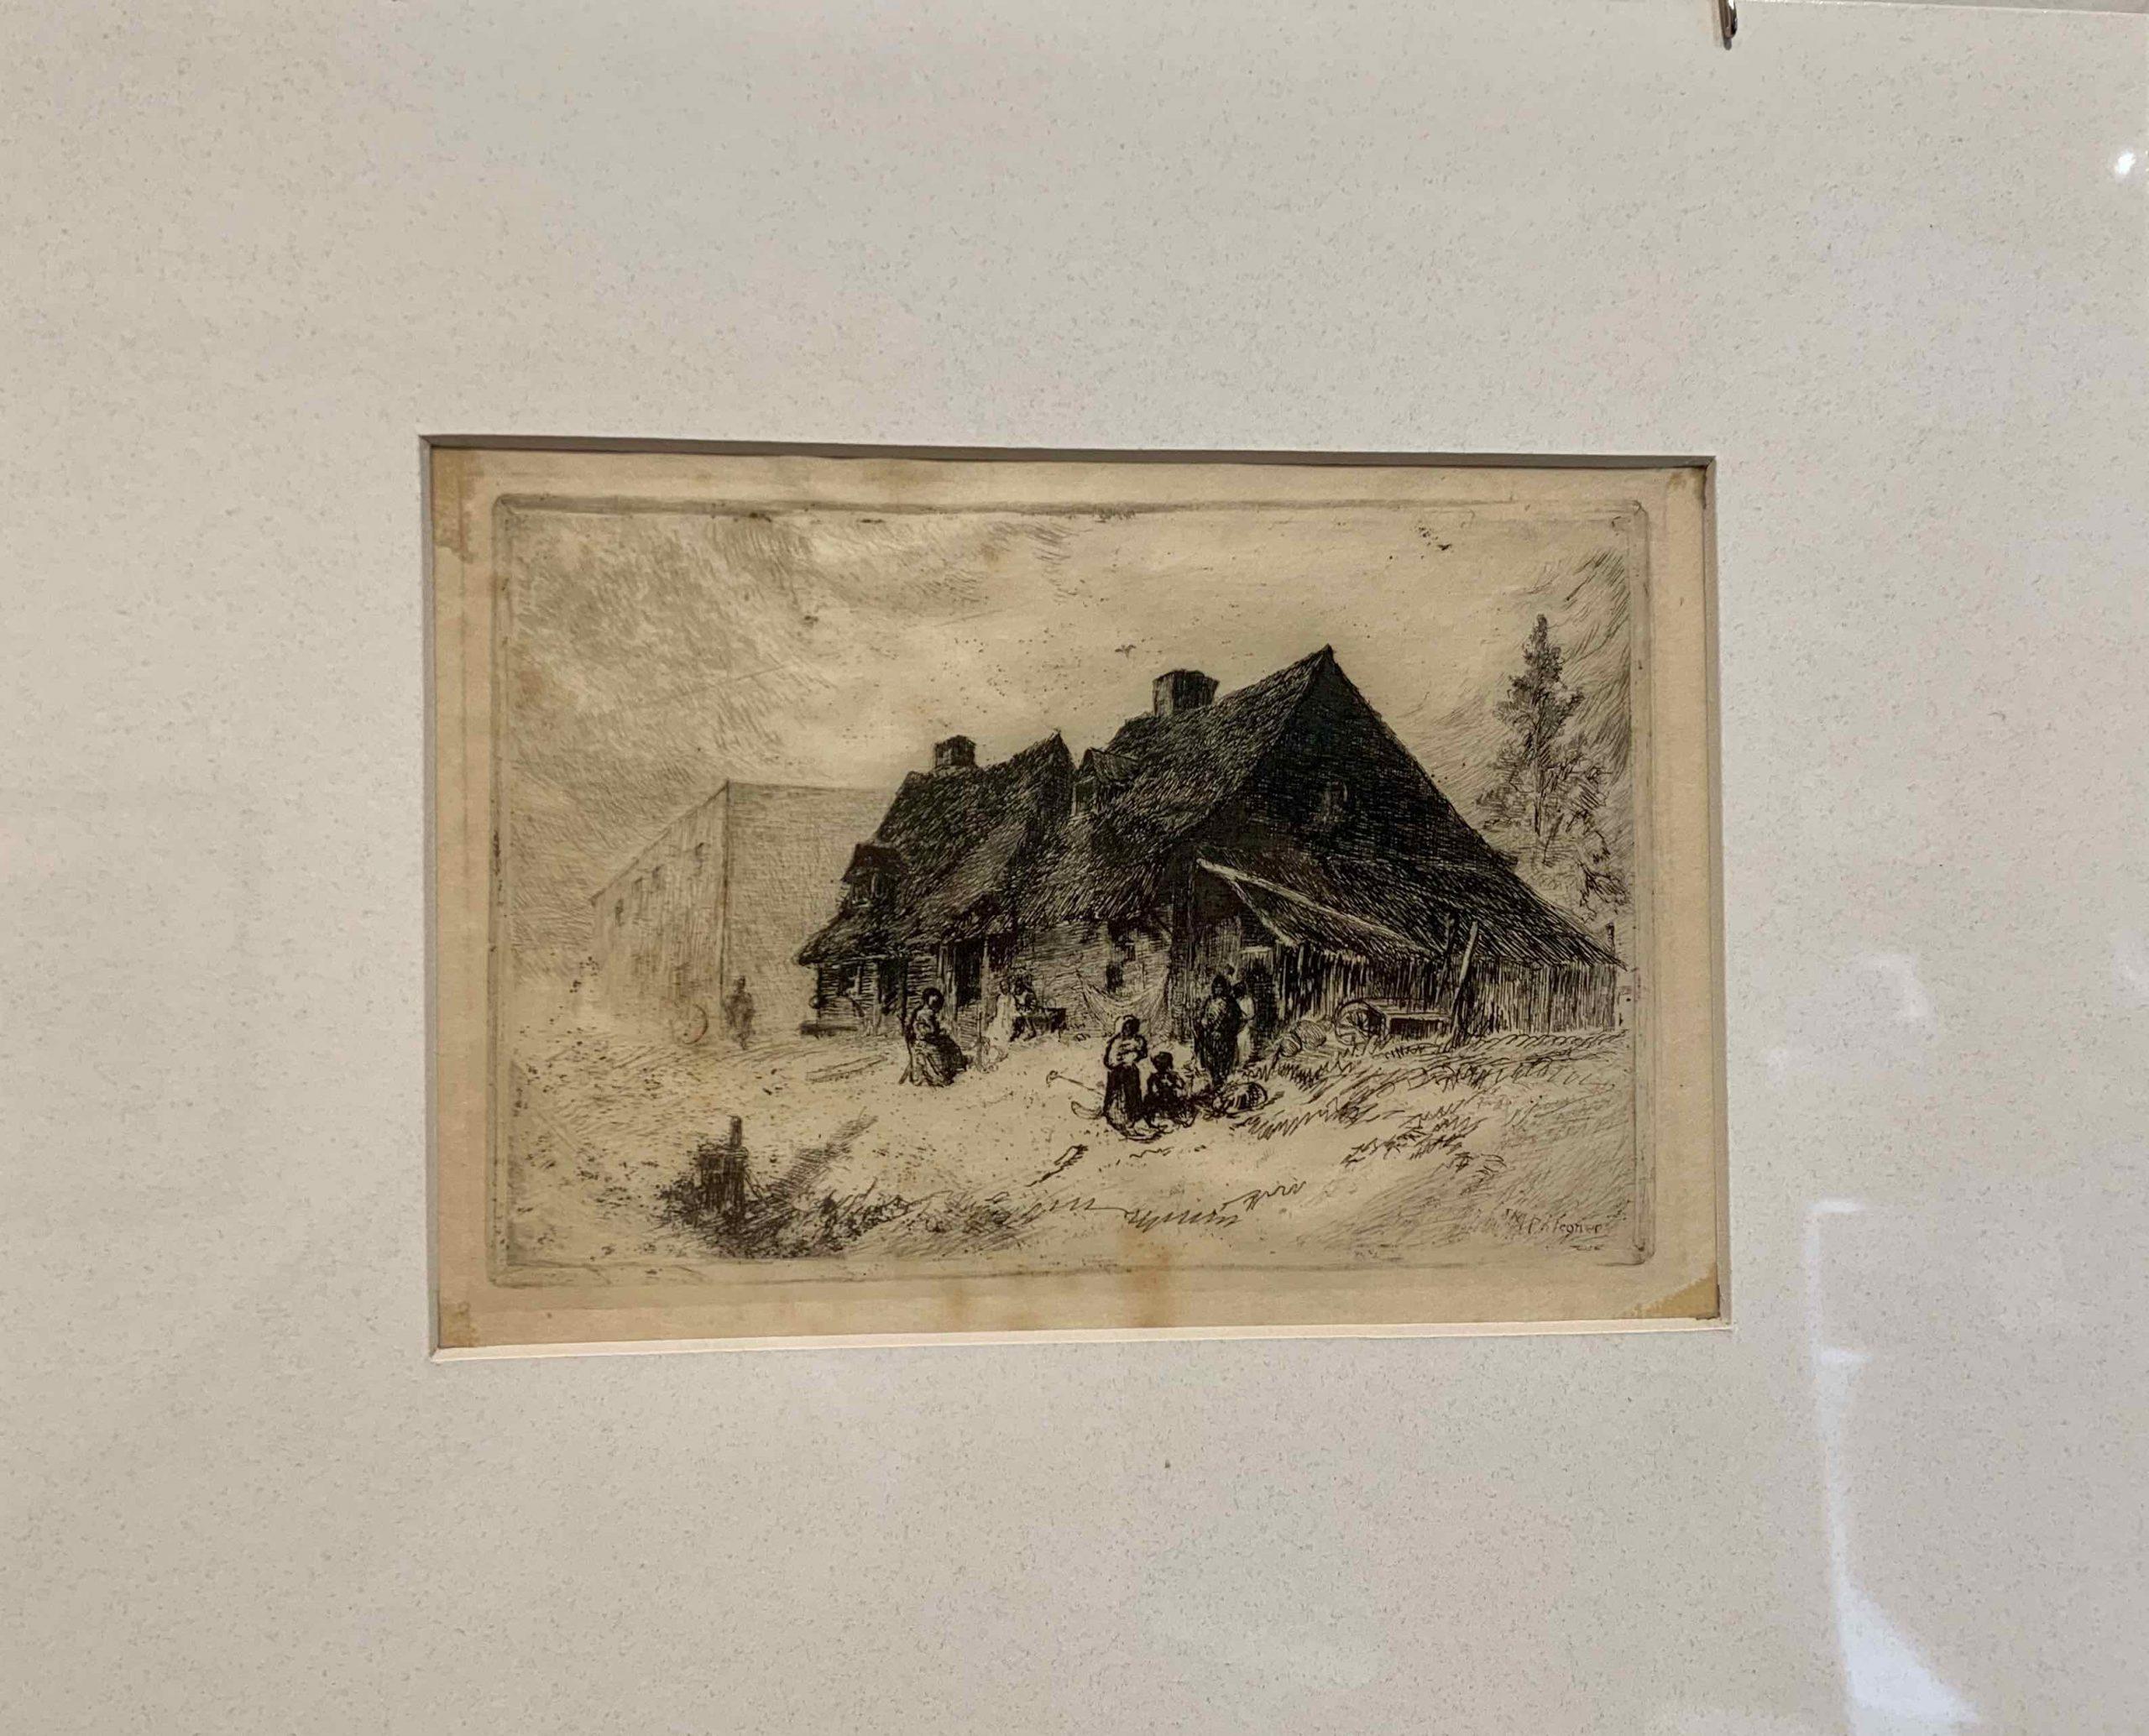 Negro Huts at Wilmington, N.C. (1880) John Mackie Falconer